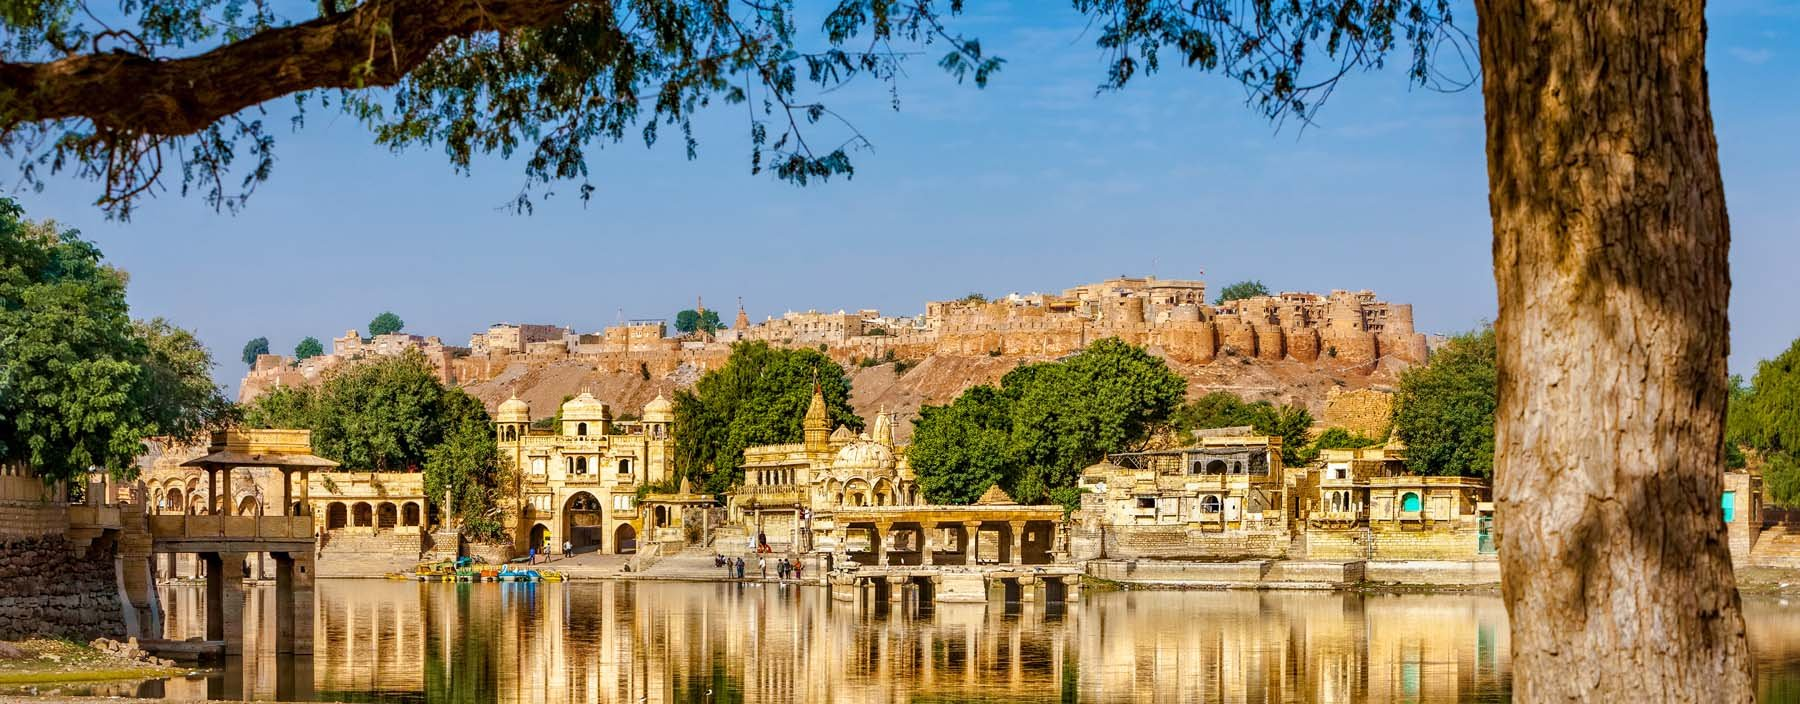 in, jaisalmer, temples and shrines around the lake gadisar jaisalmer.jpg